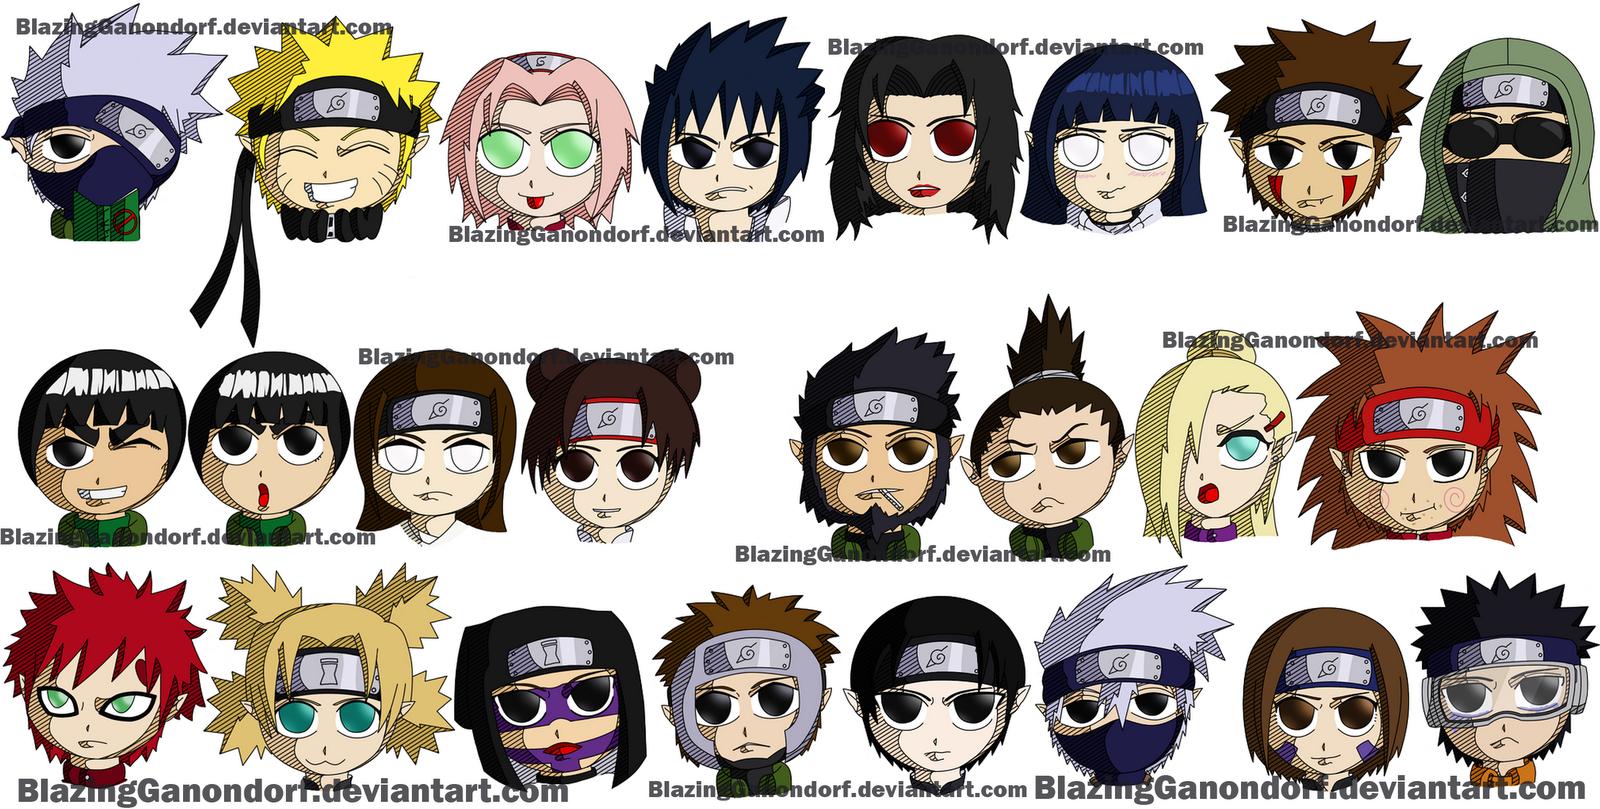 Naruto Characters Wallpaper - WallpaperSafari